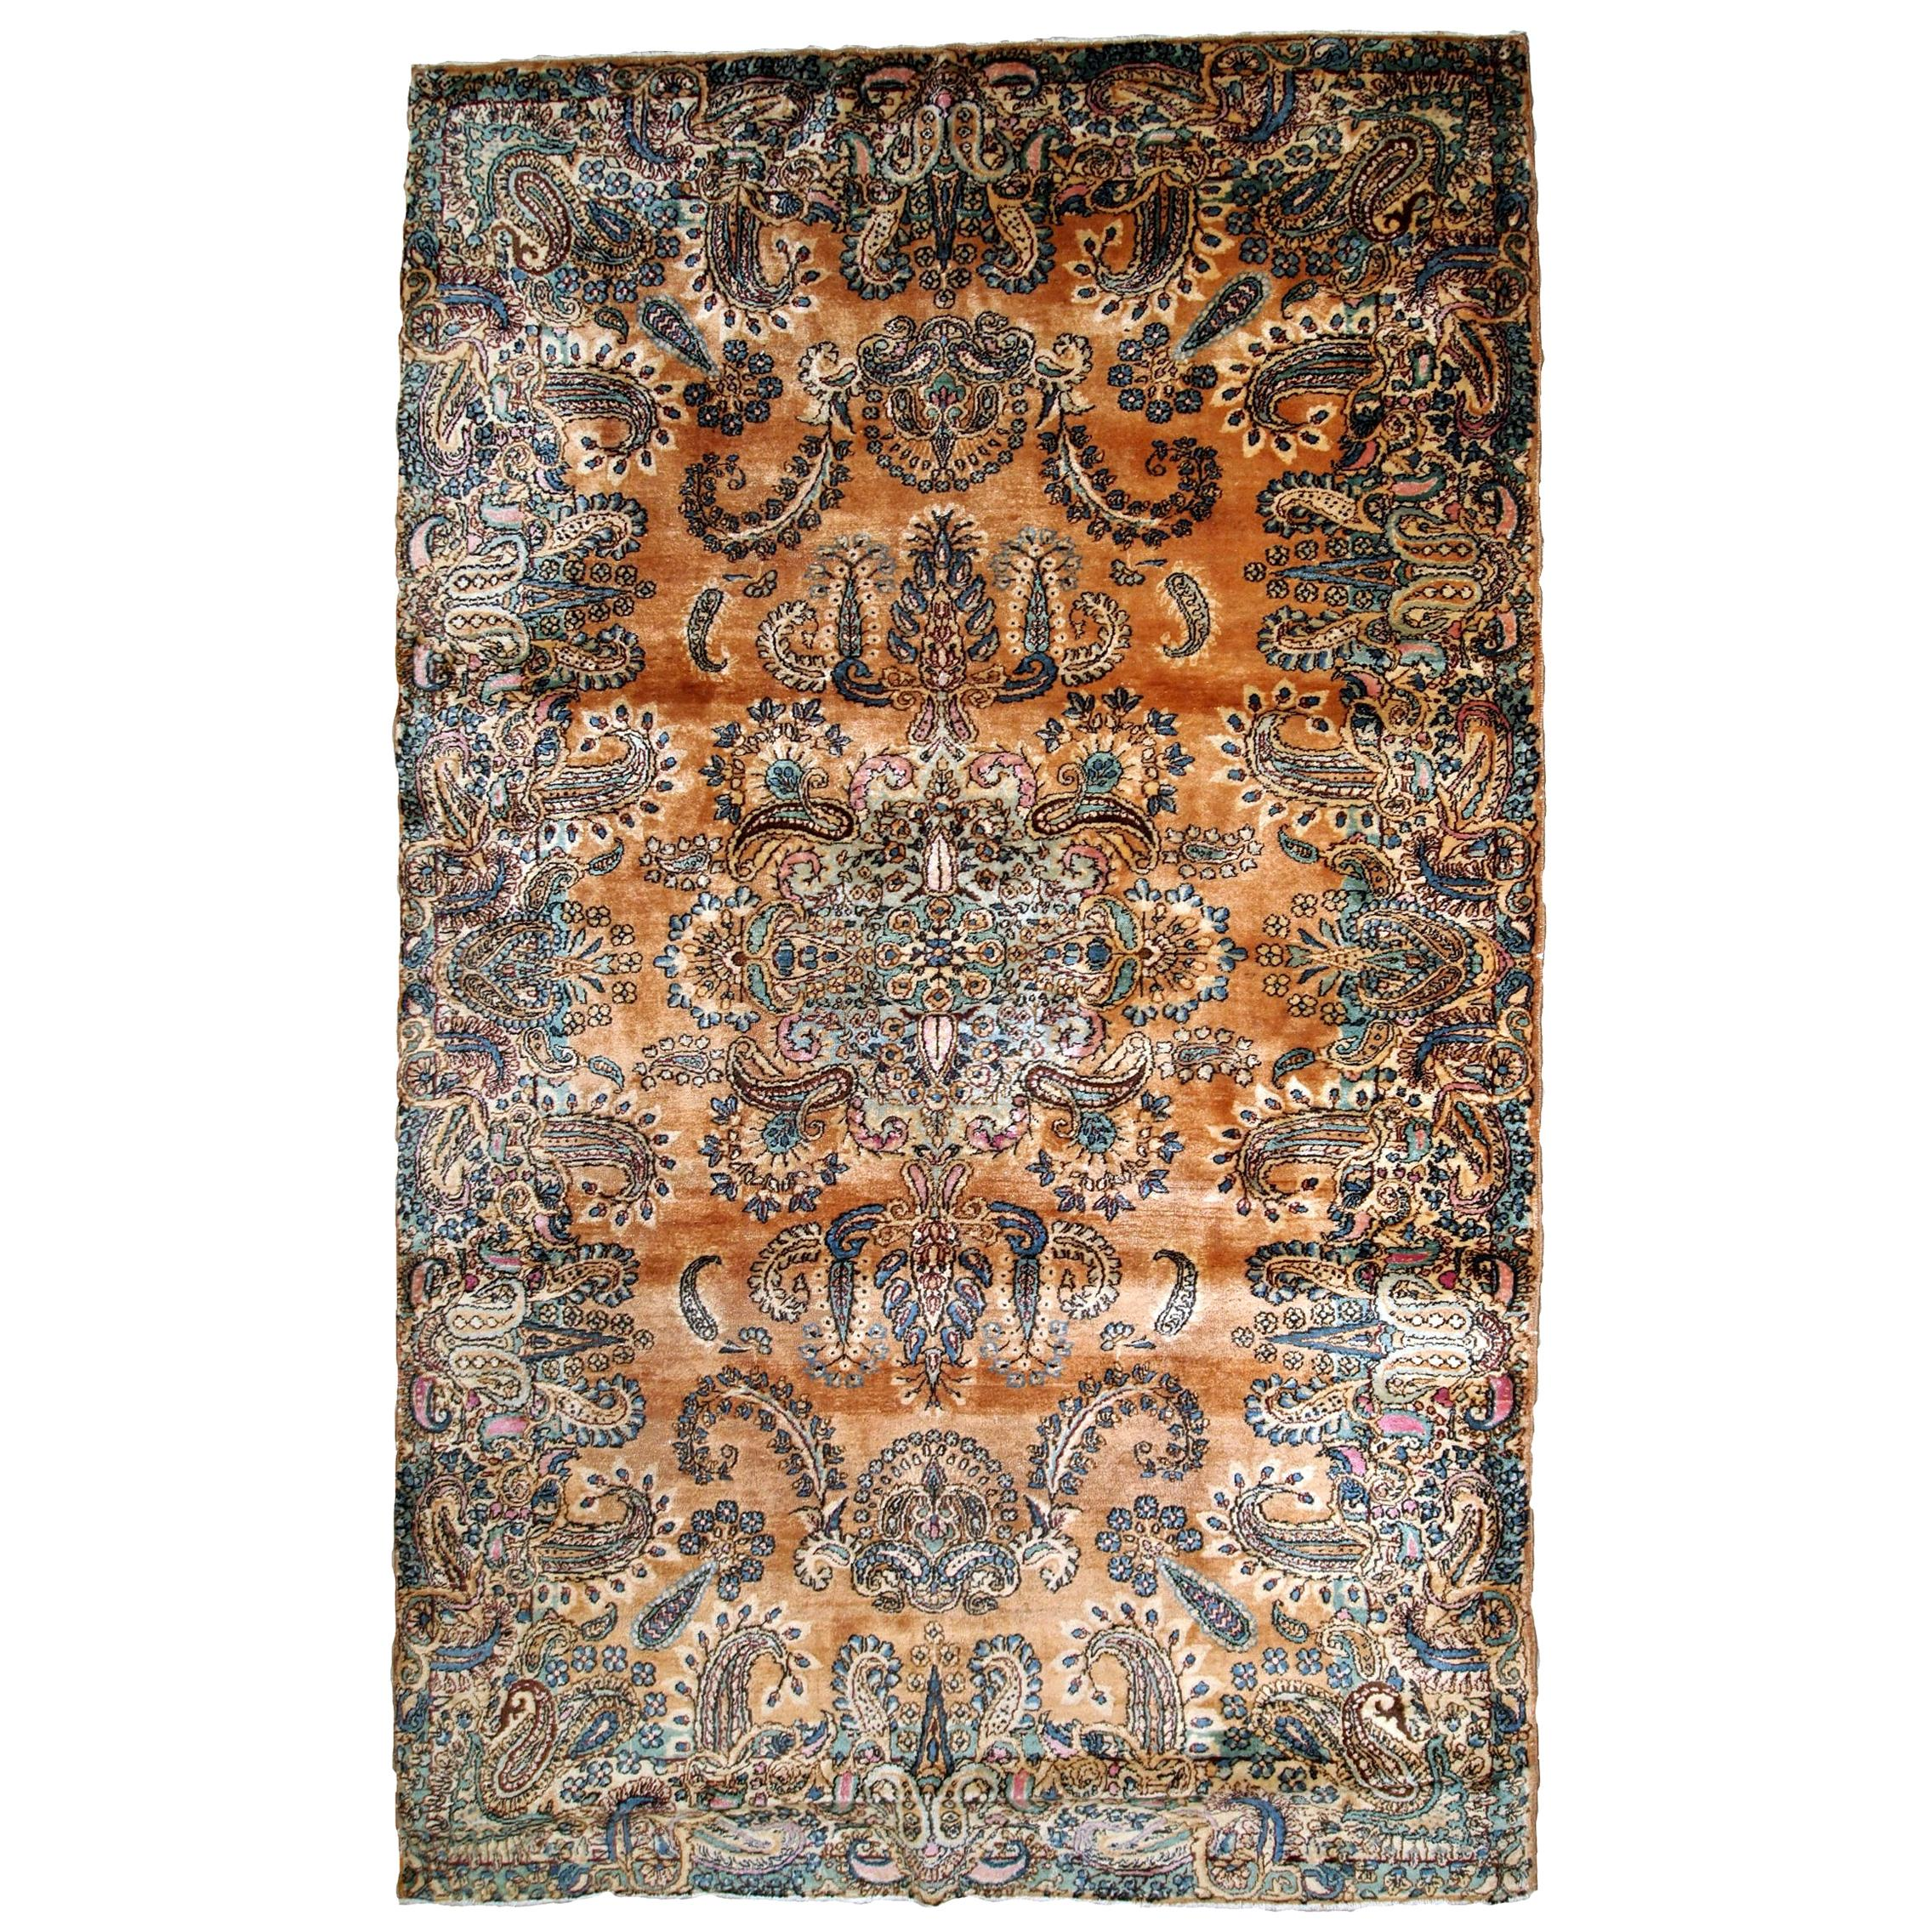 Handmade Antique Kerman Style Rug, 1920s